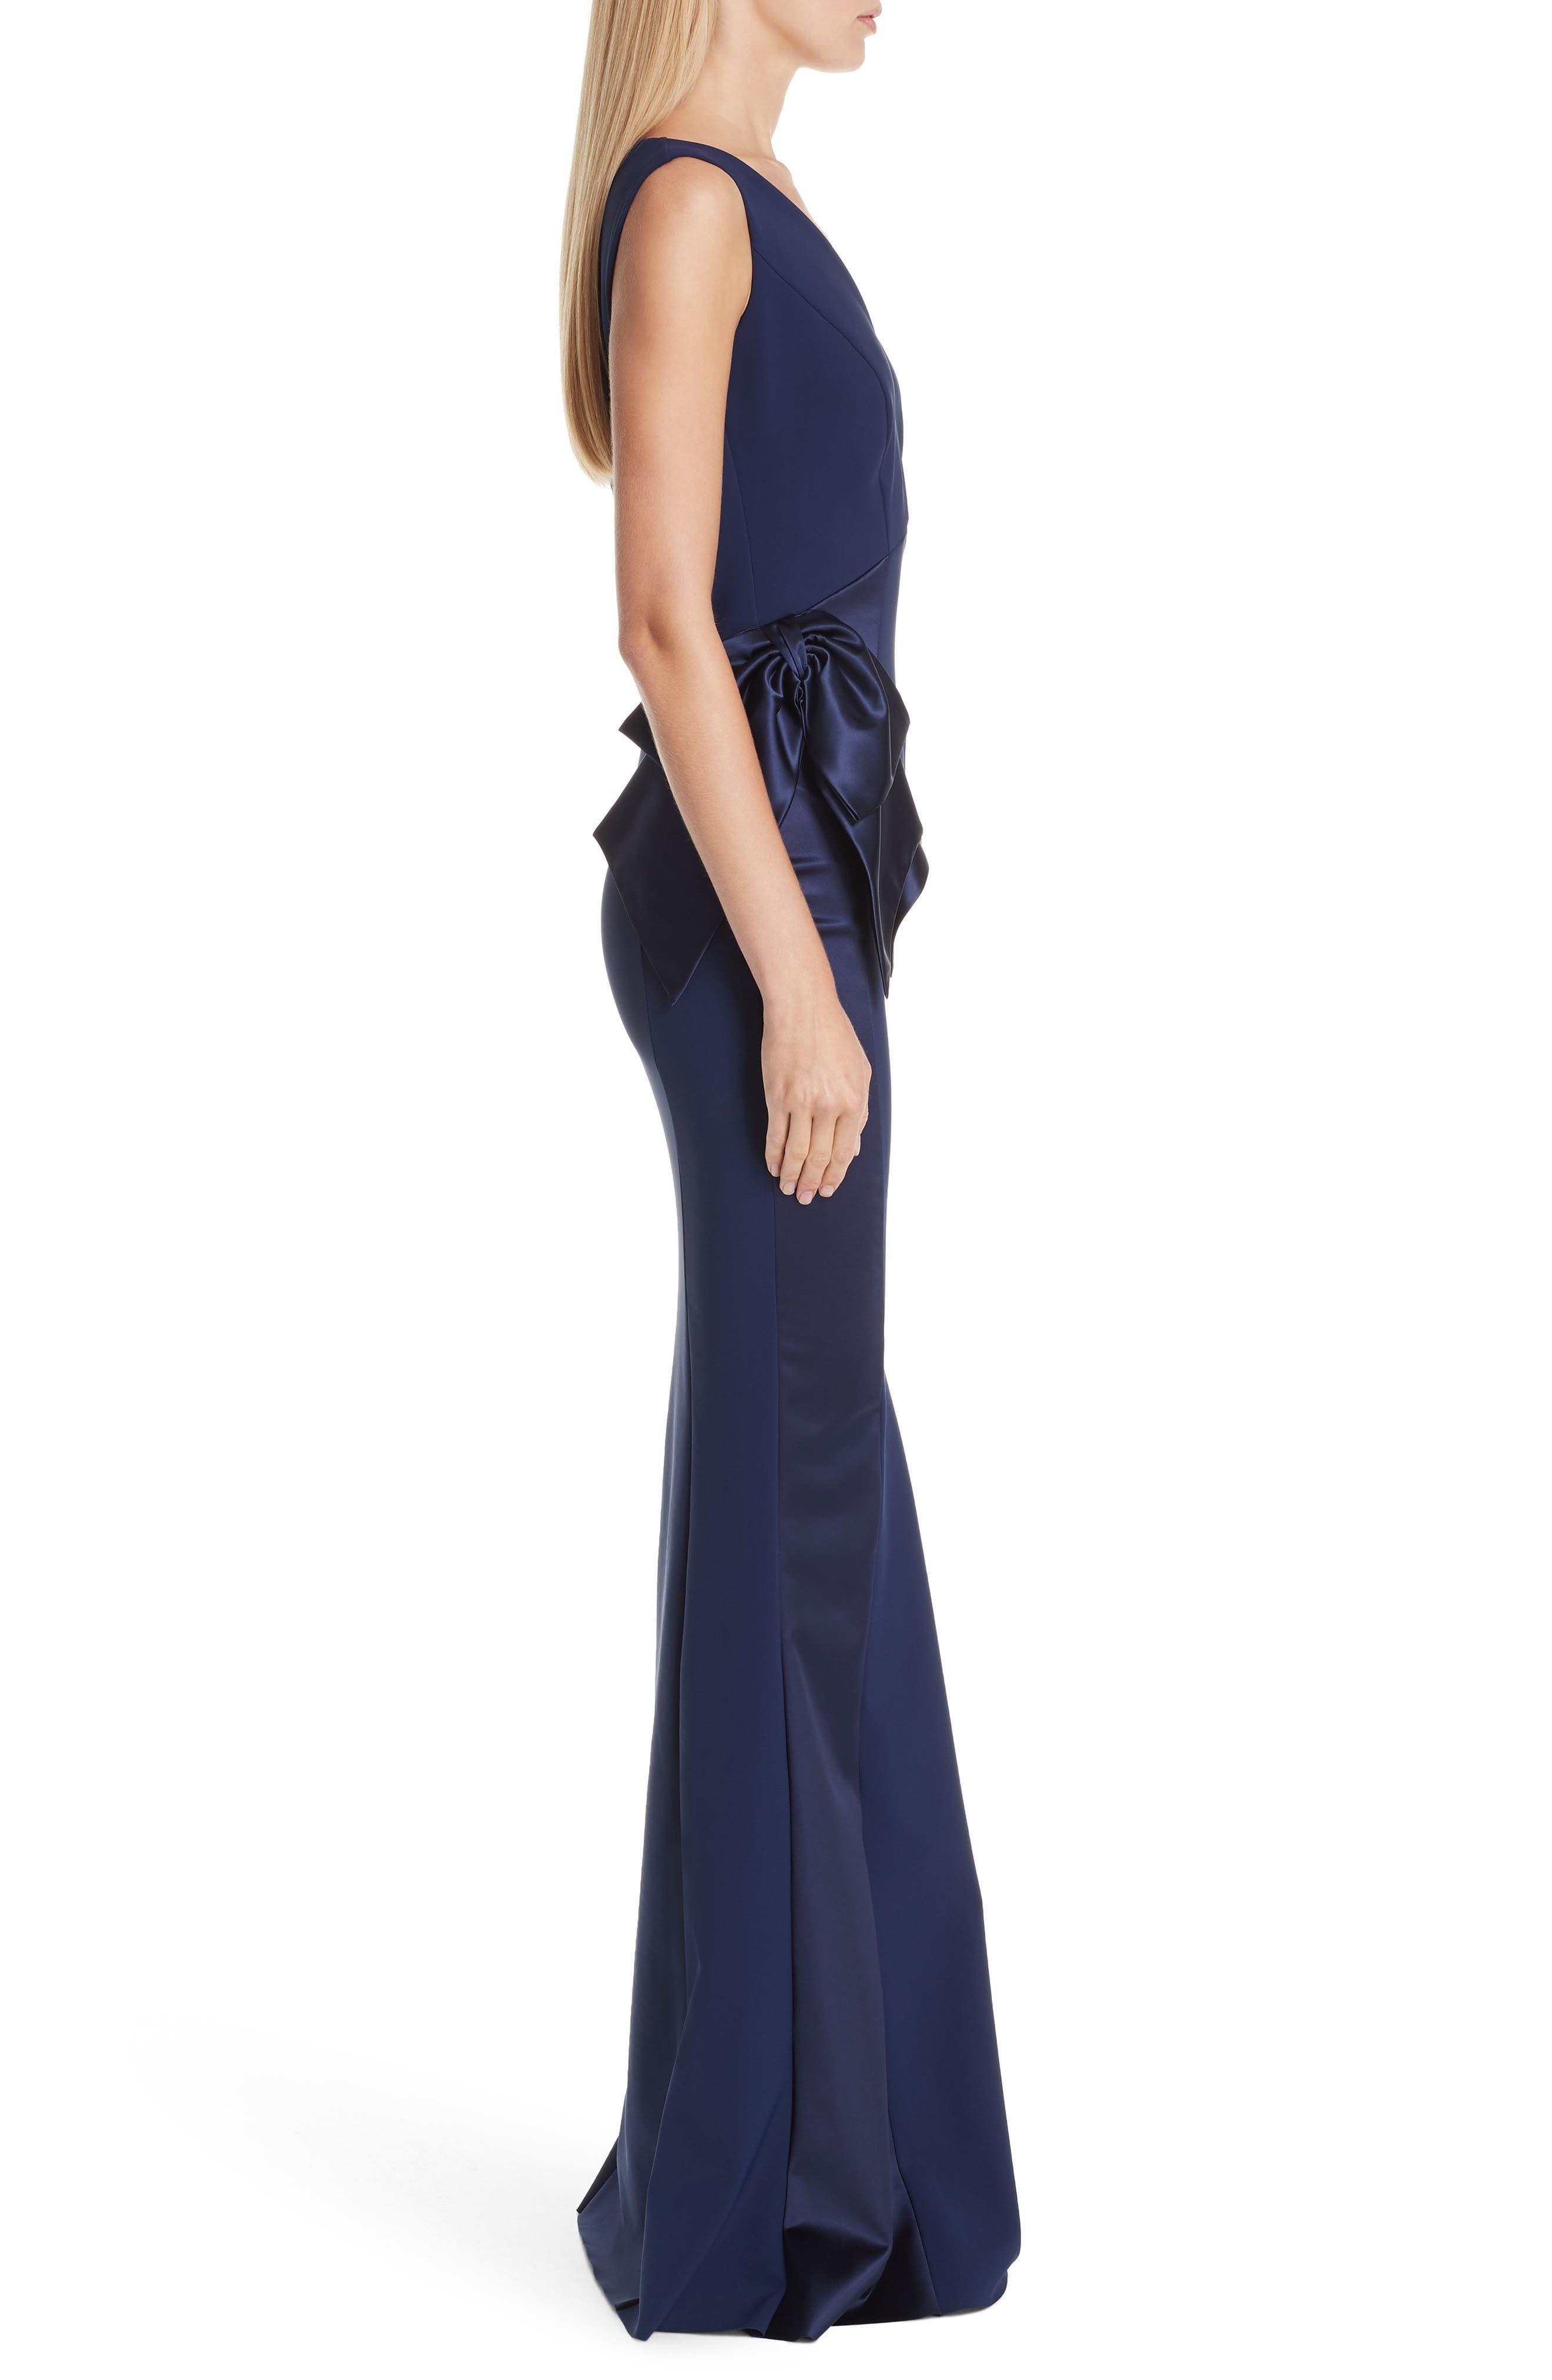 Macaria Satin Bow Trumpet Gown,                             Alternate thumbnail 3, color,                             BLUE NOTTE